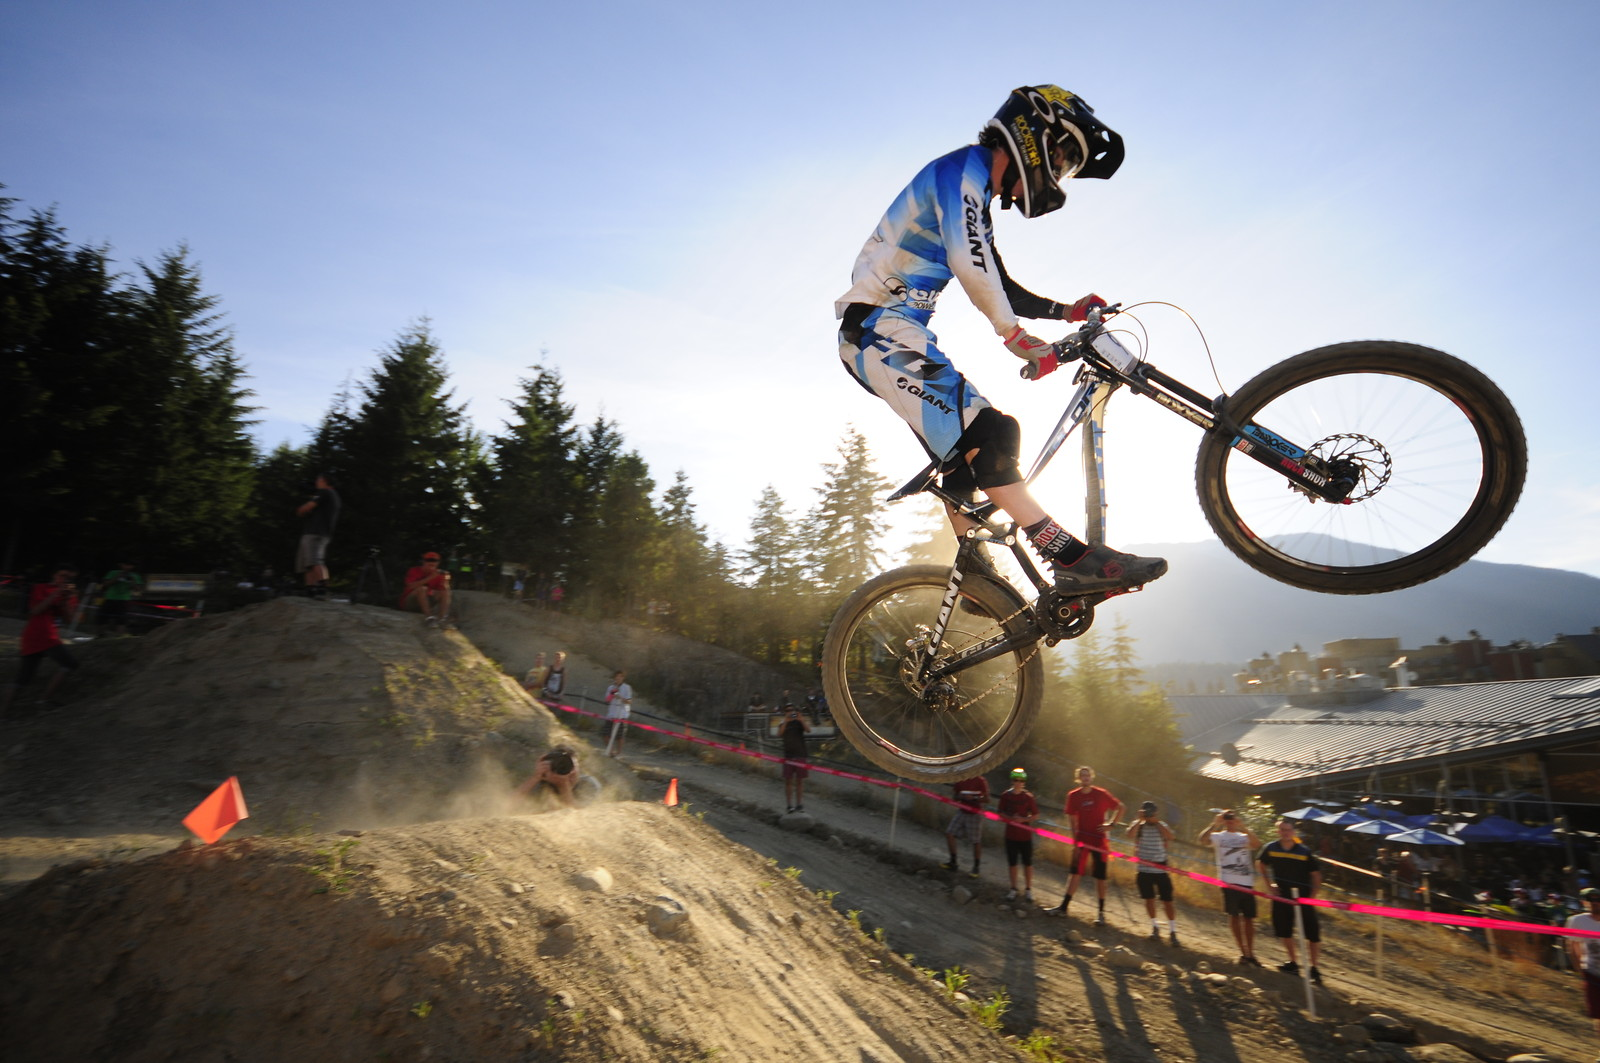 Garbanzo DH - ezefaccio - Mountain Biking Pictures - Vital MTB